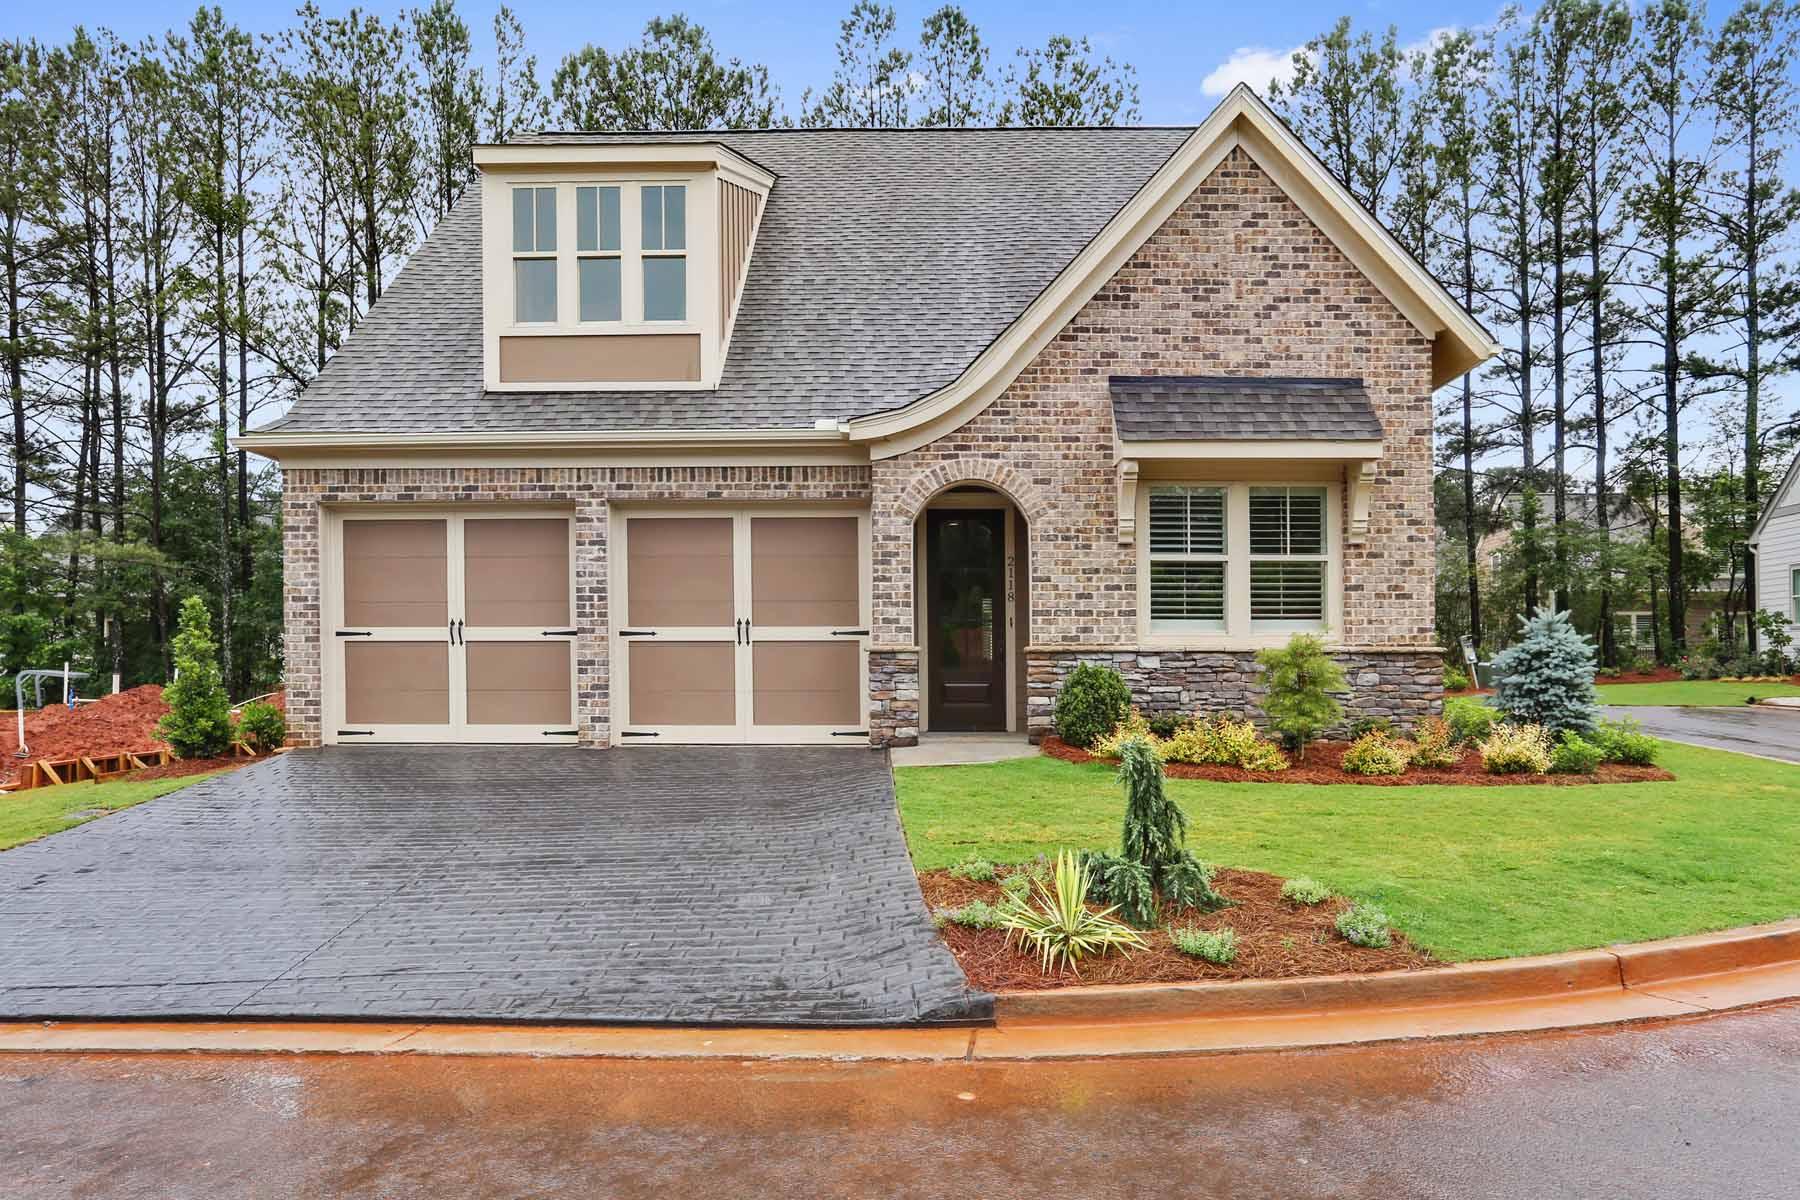 獨棟家庭住宅 為 出售 在 Premier Active Adult Community 366 Hotchkiss Lane, Marietta, 喬治亞州, 30062 美國